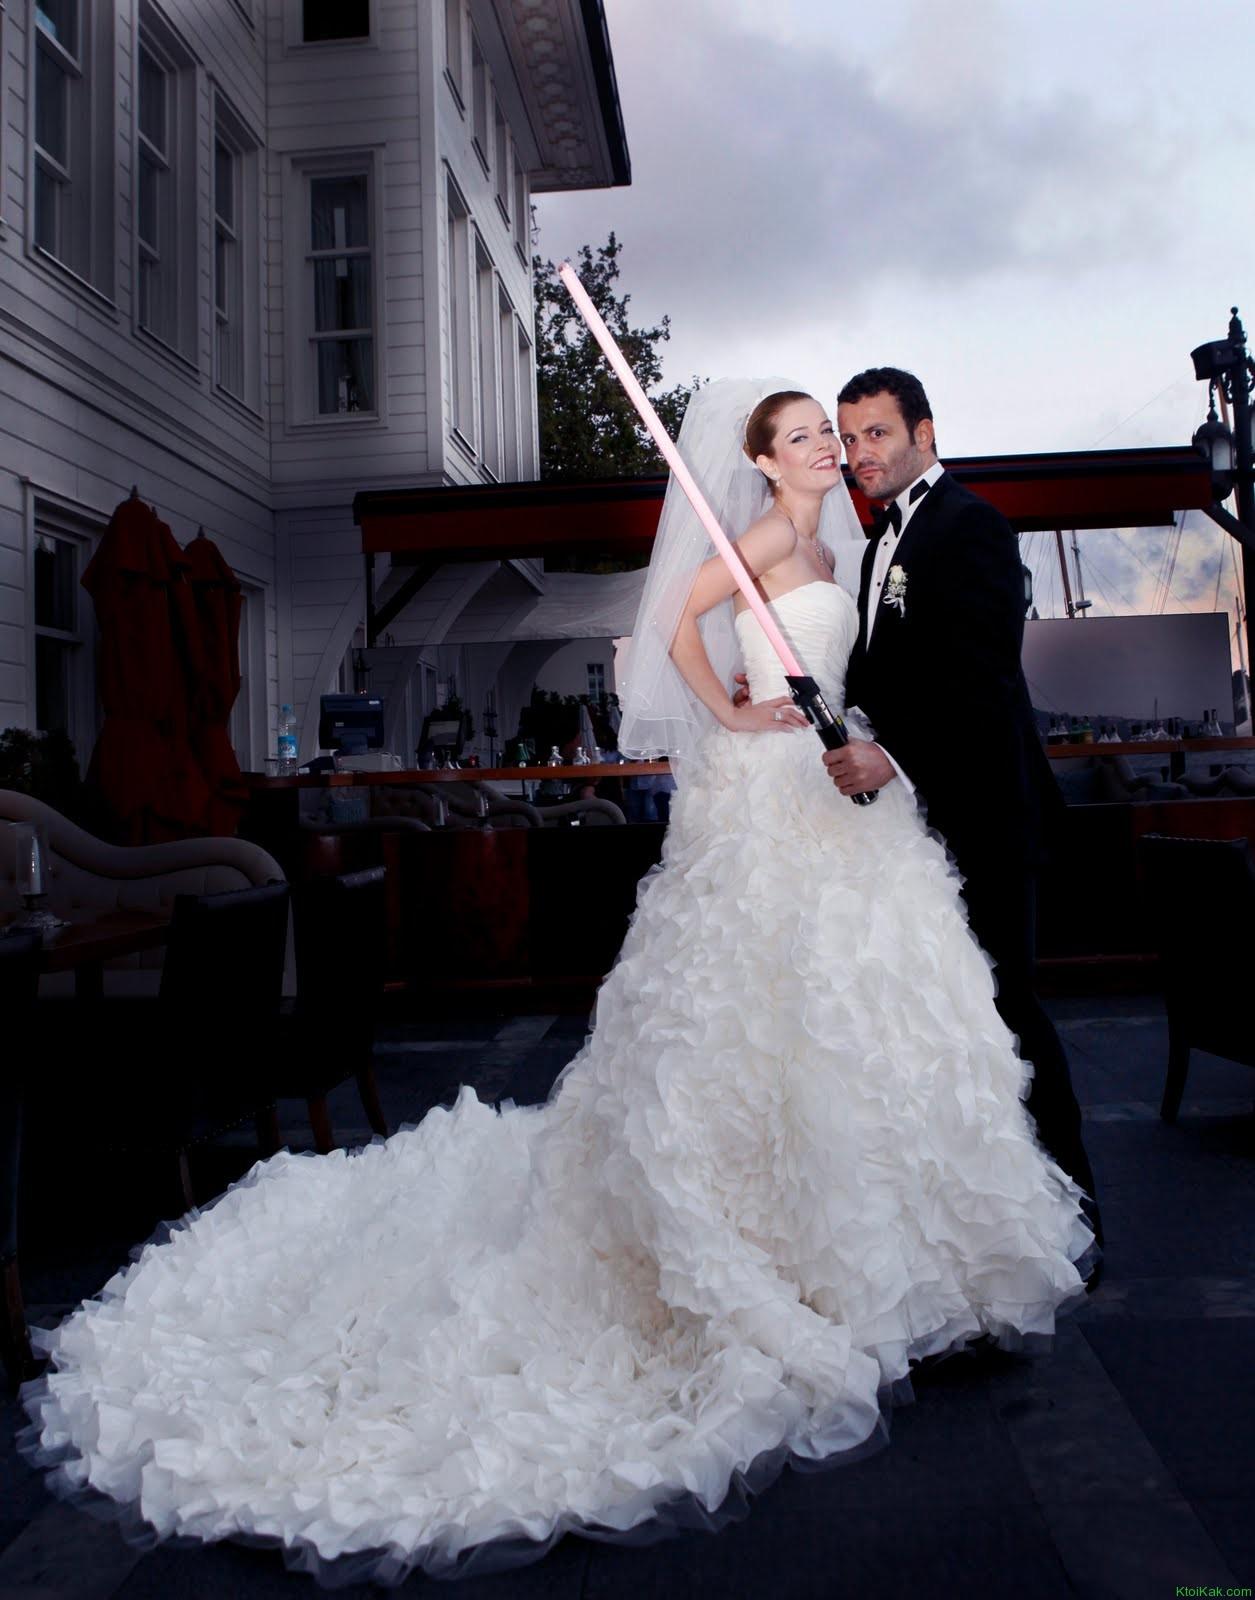 бегюм кютюк свадьба